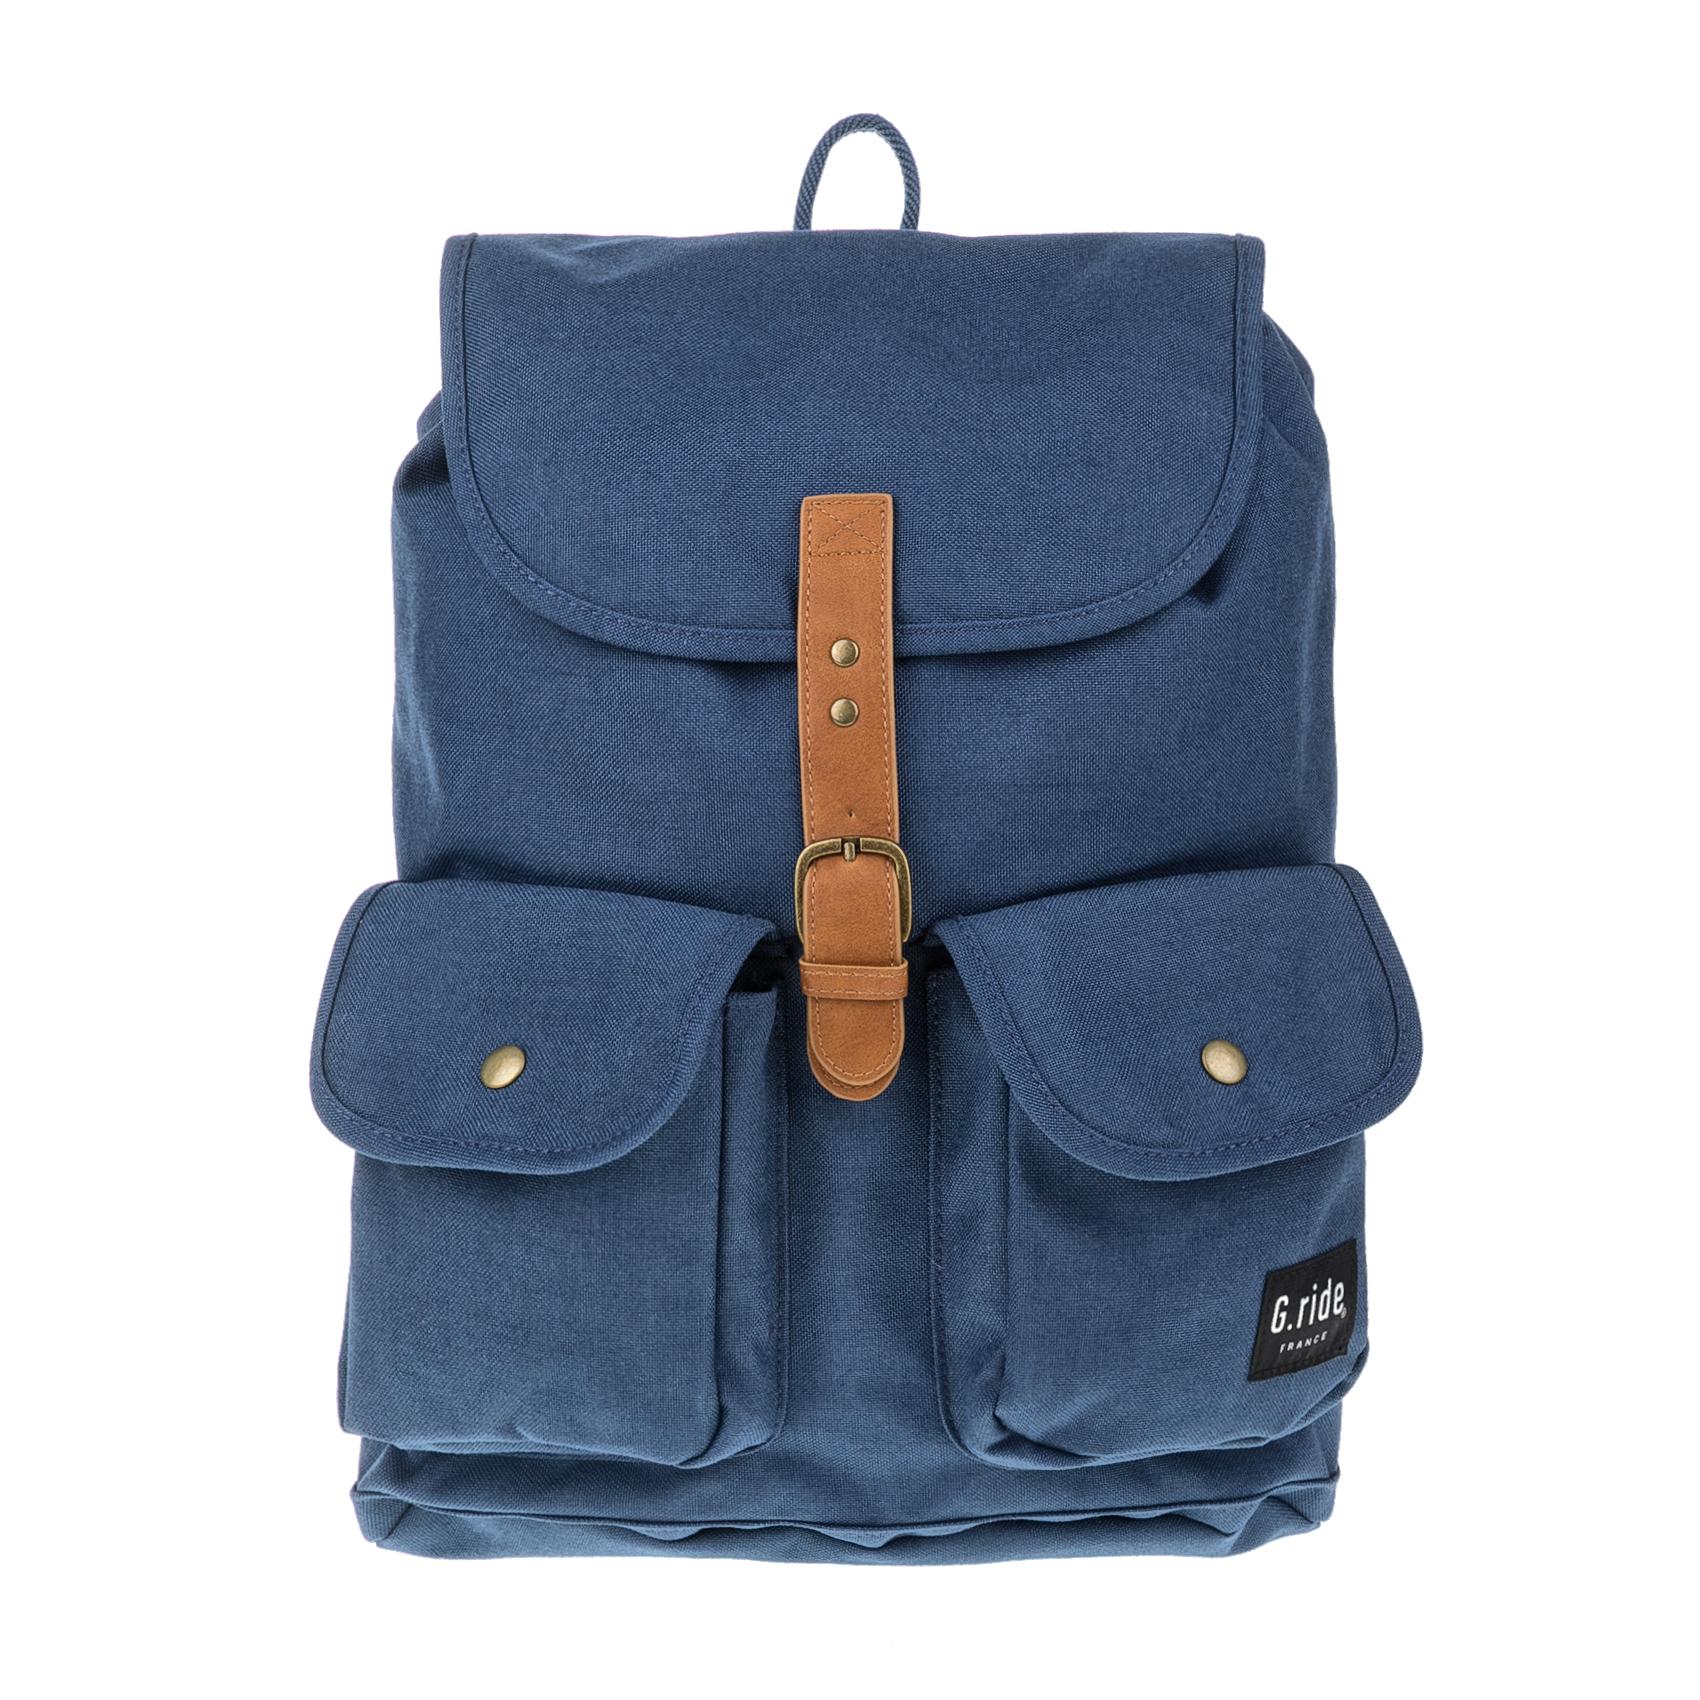 G.RIDE - Τσάντα πλάτης CHLOE μπλε γυναικεία αξεσουάρ τσάντες σακίδια πλάτης